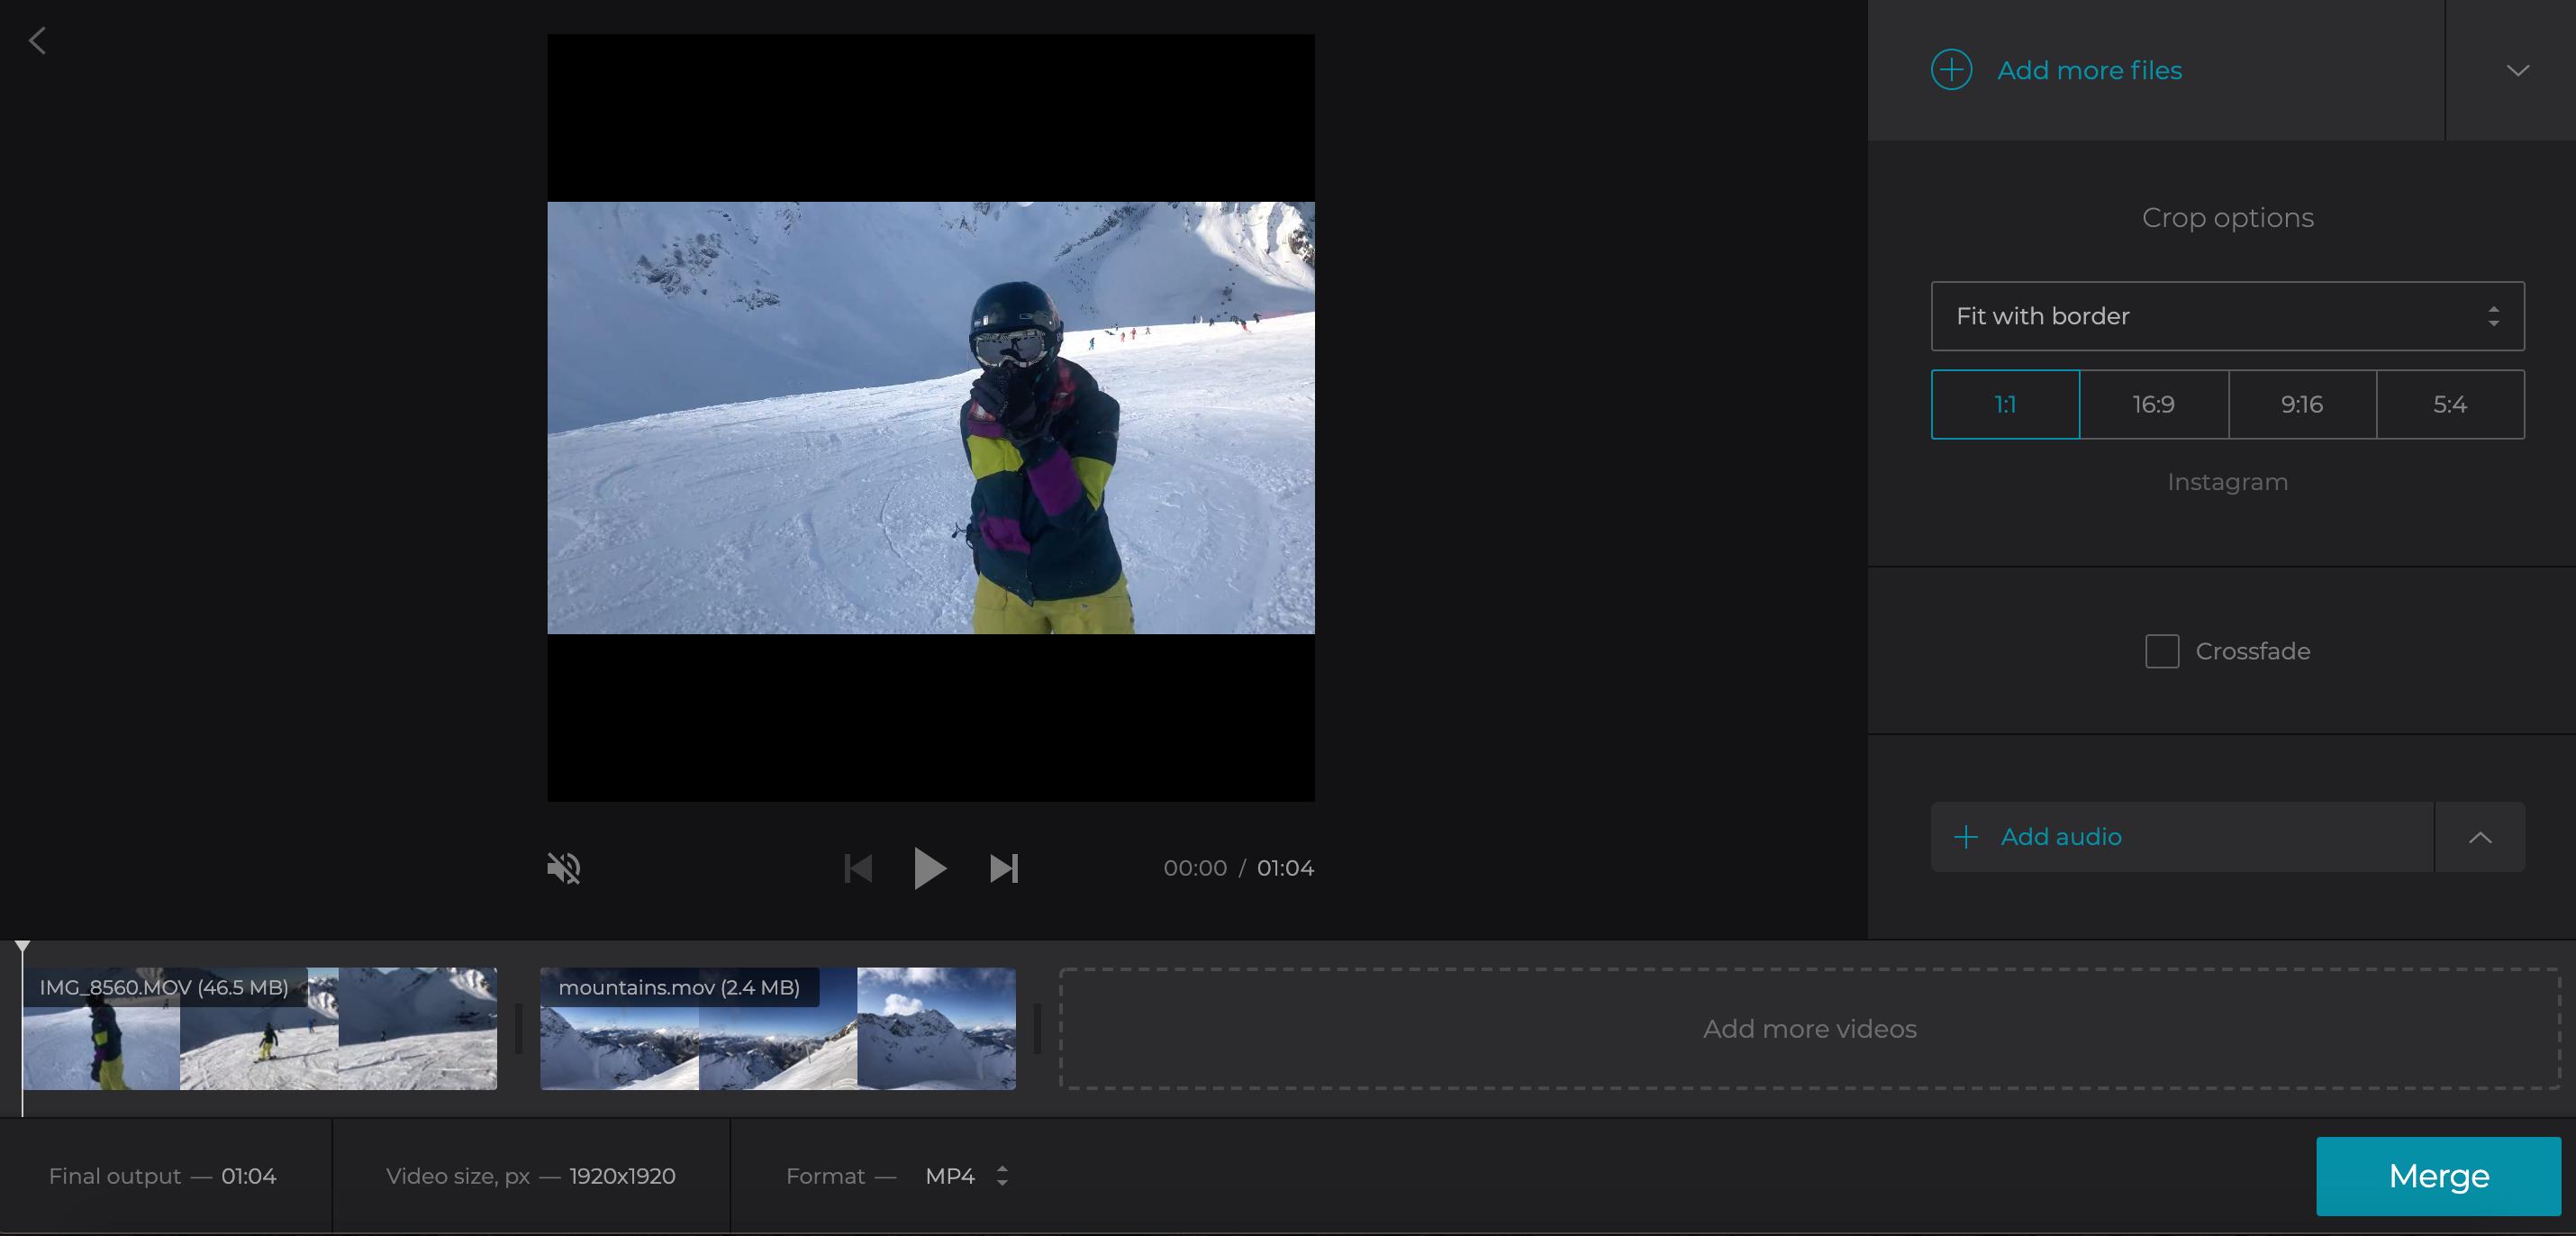 Adjust and merge the uploaded videos